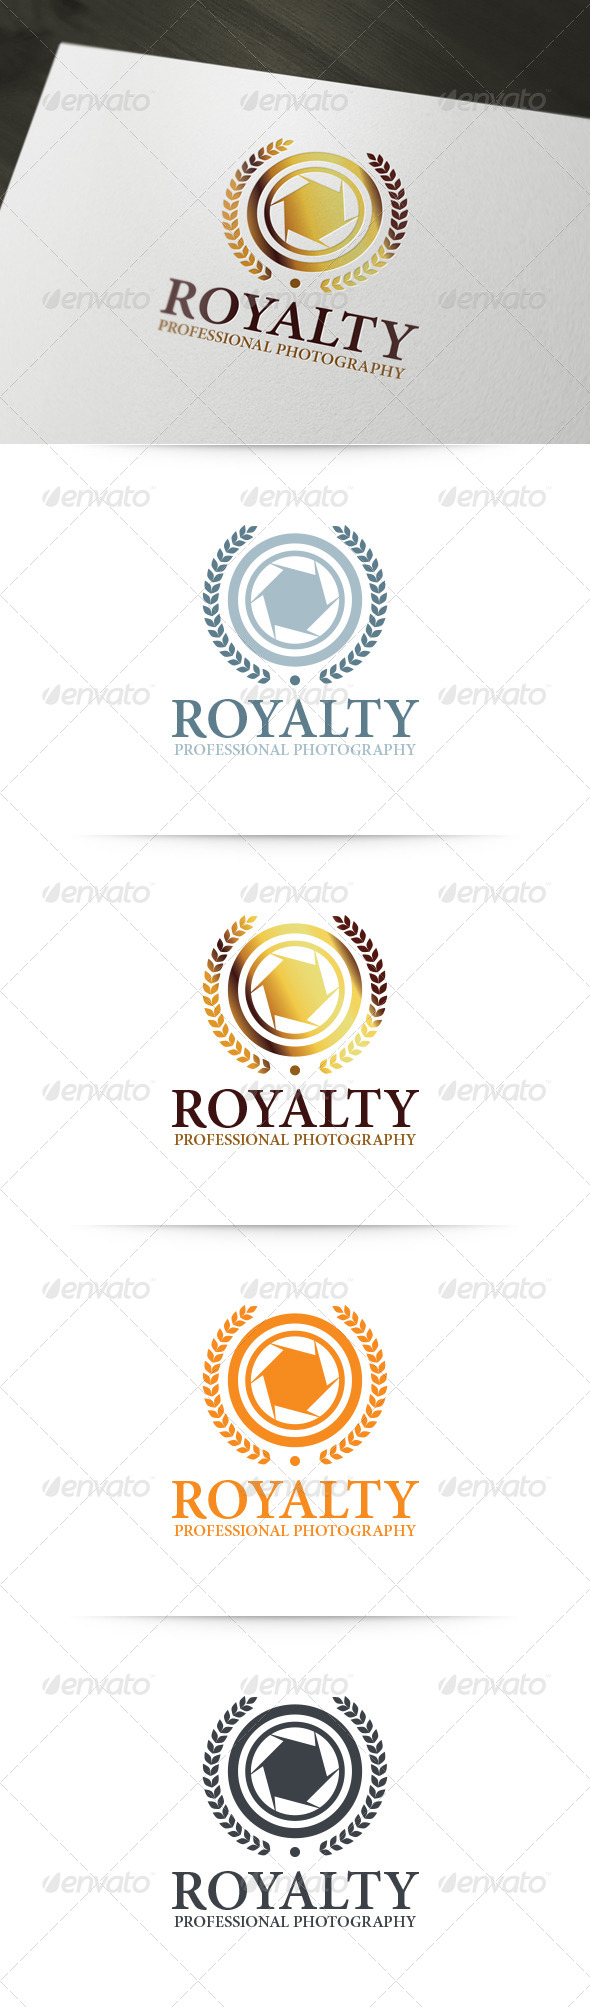 Royalty - Photography Logo - Symbols Logo Templates